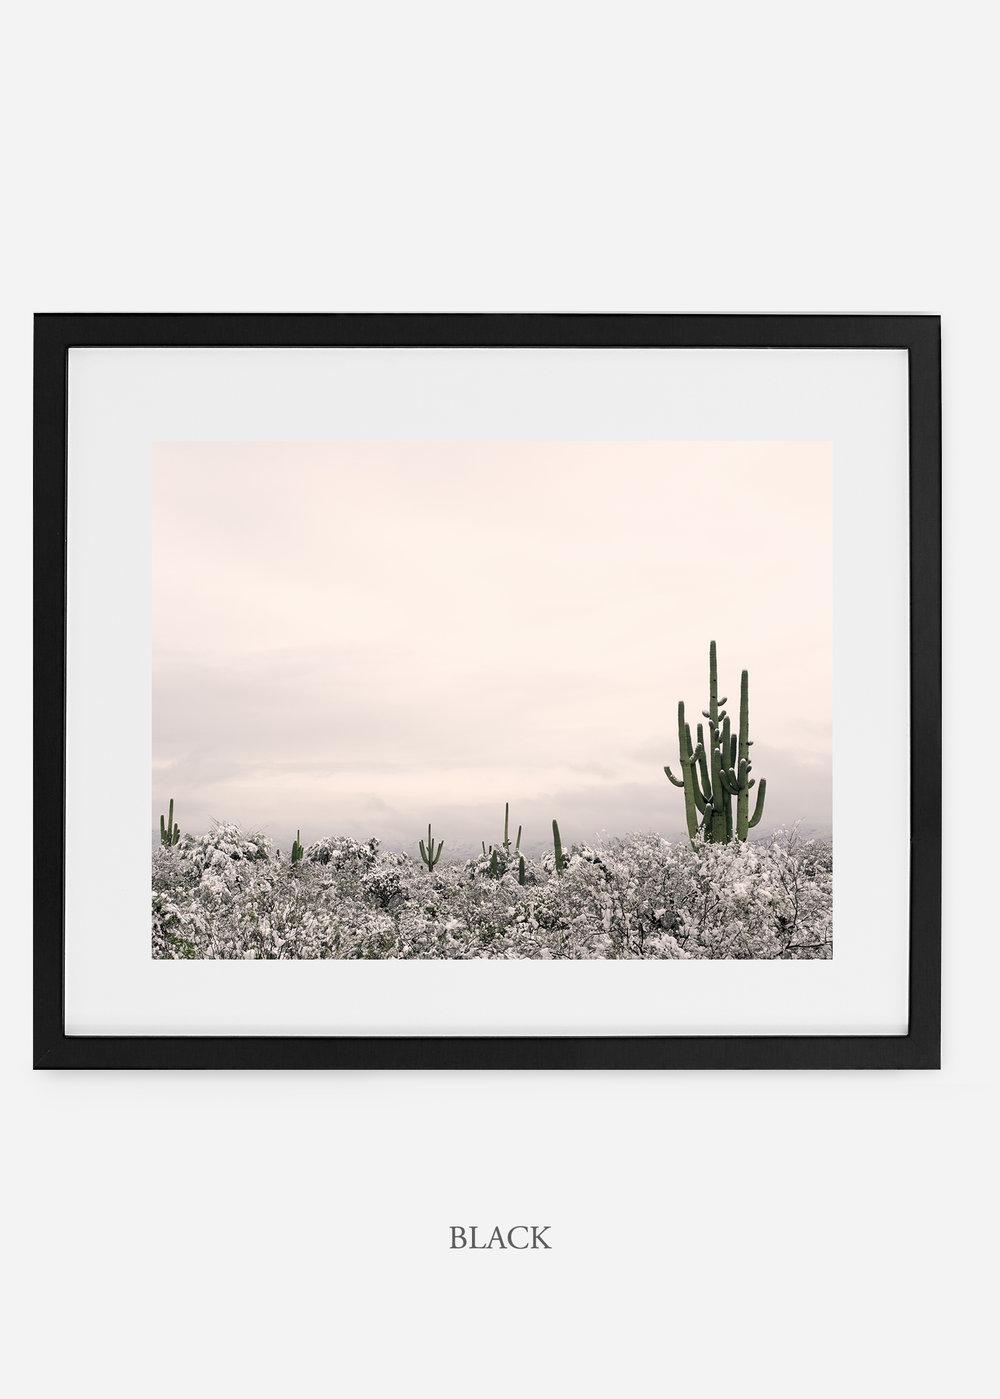 blackframe-saguaroNo.7-wildercalifornia-art-wallart-cactusprint-homedecor-prints-arizona-botanical-artwork-interiordesign.jpg